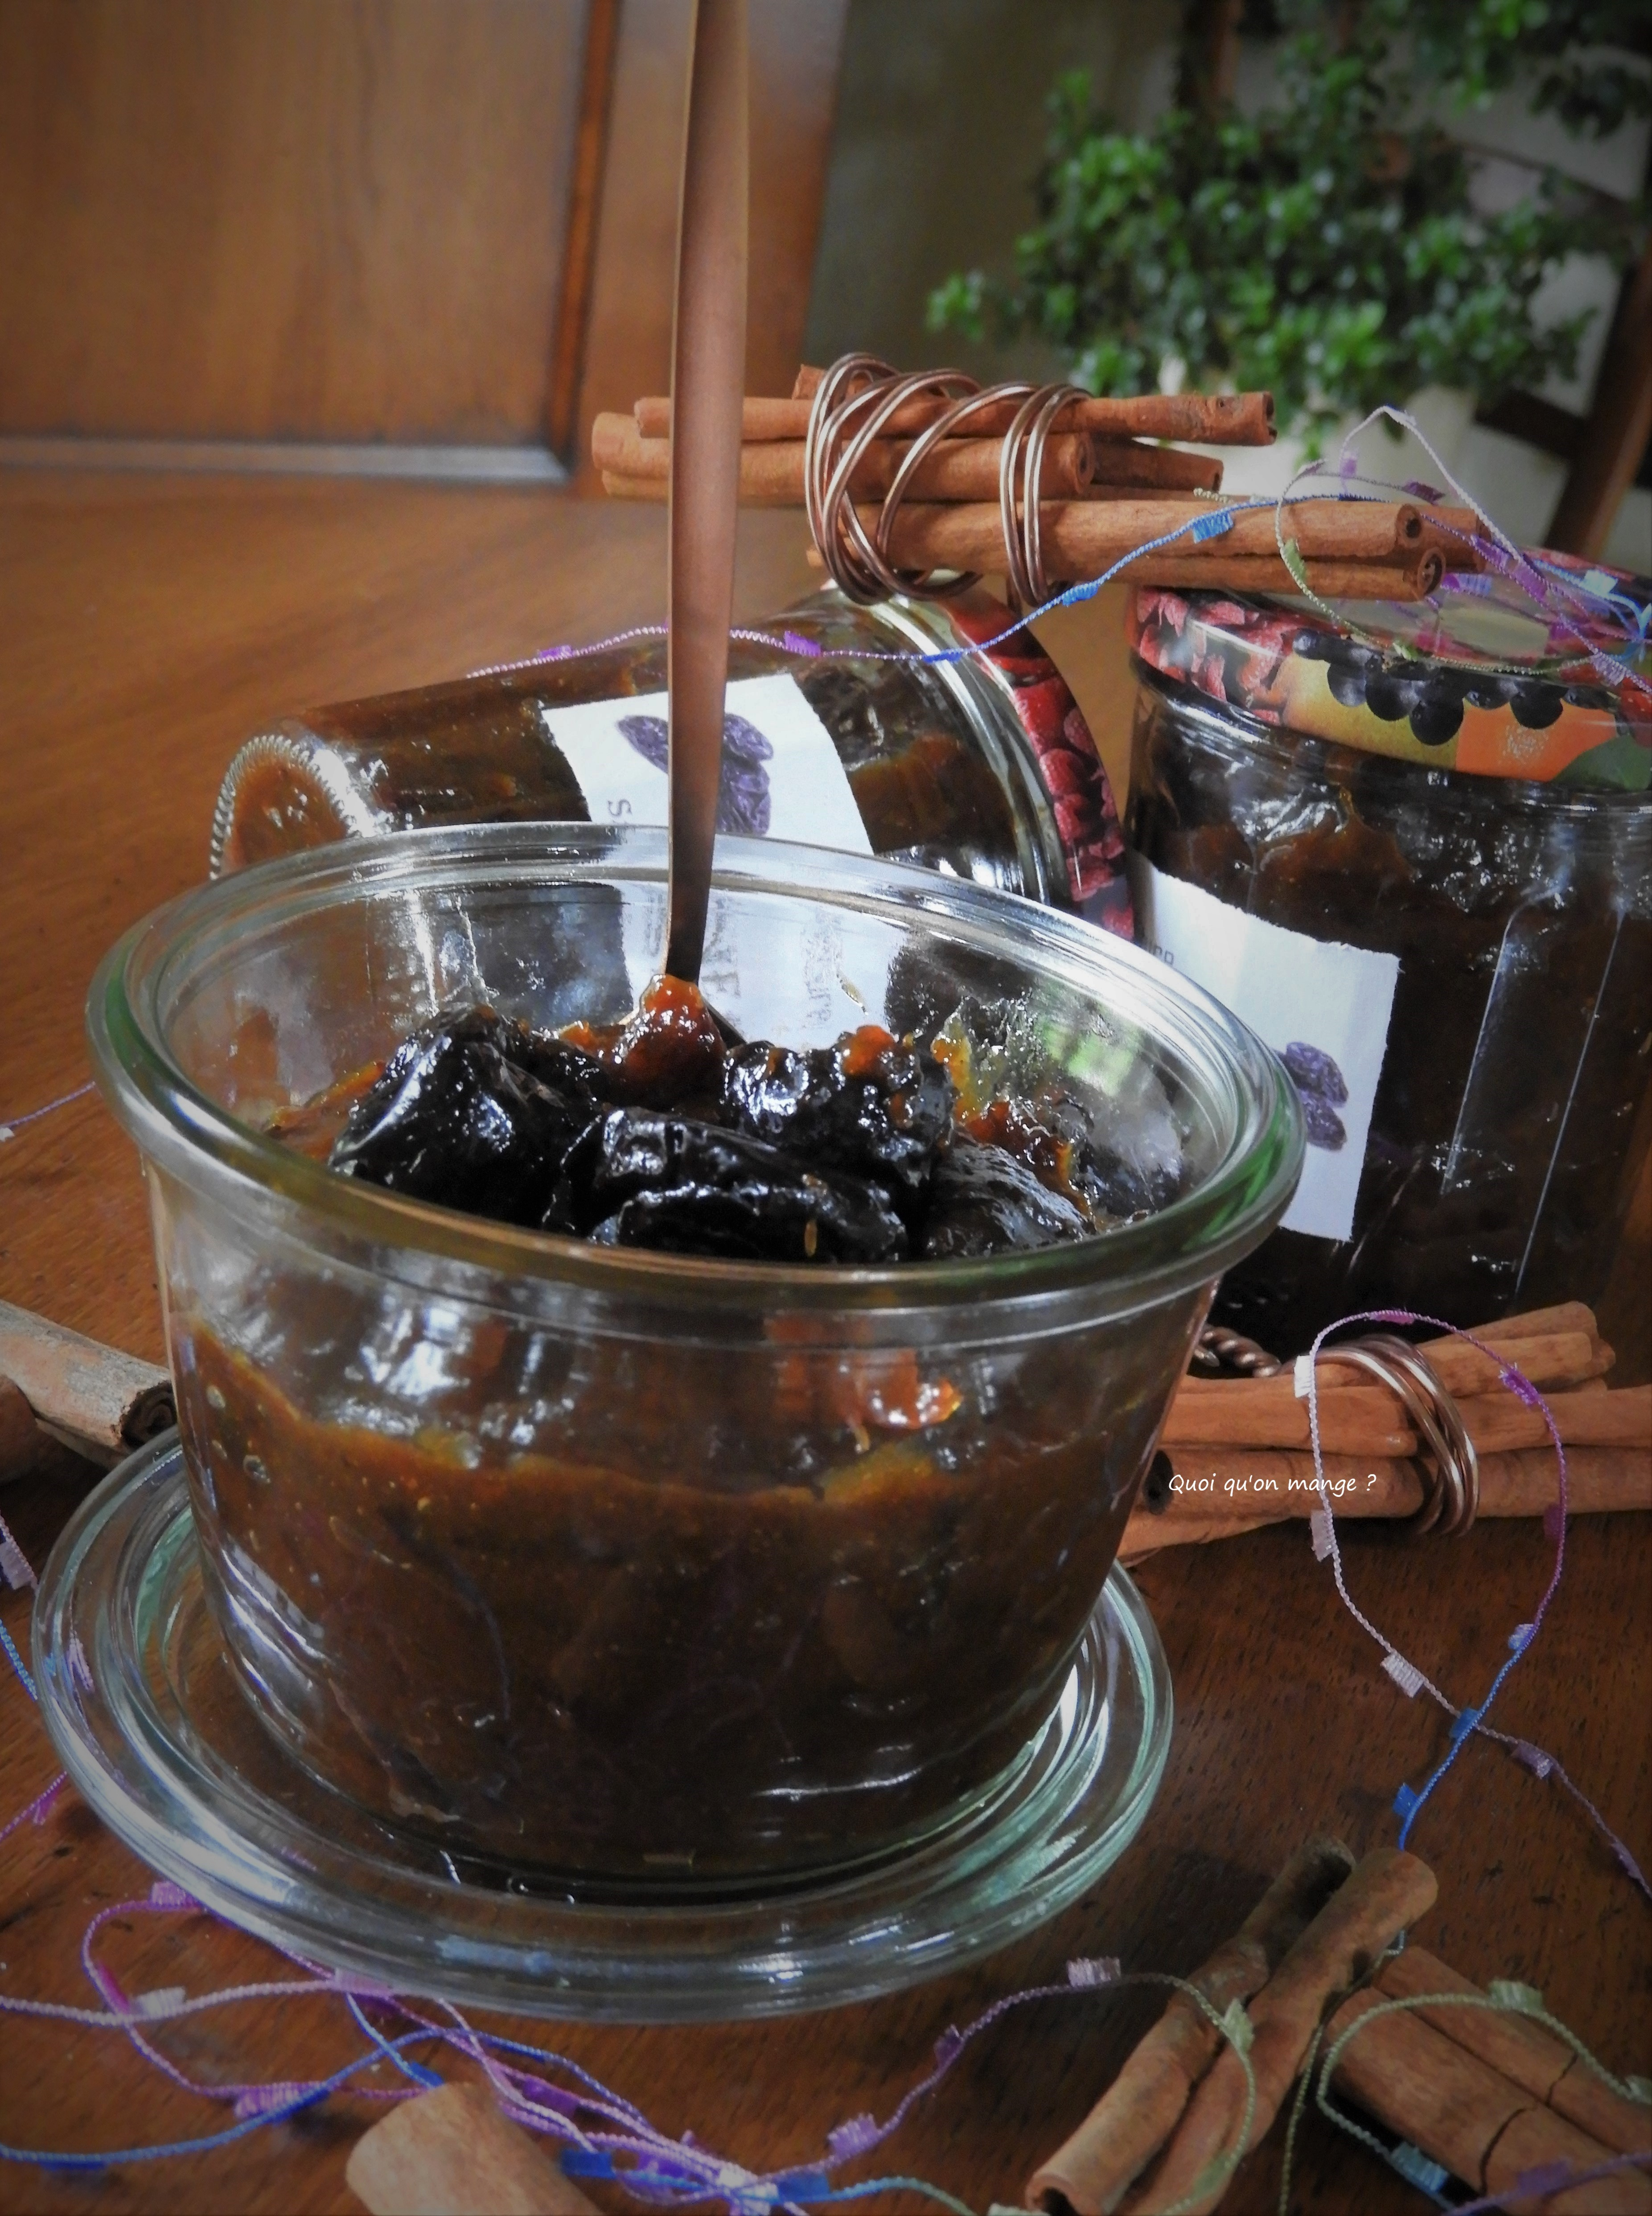 Marmelade de pruneaux saveurs d'Orient